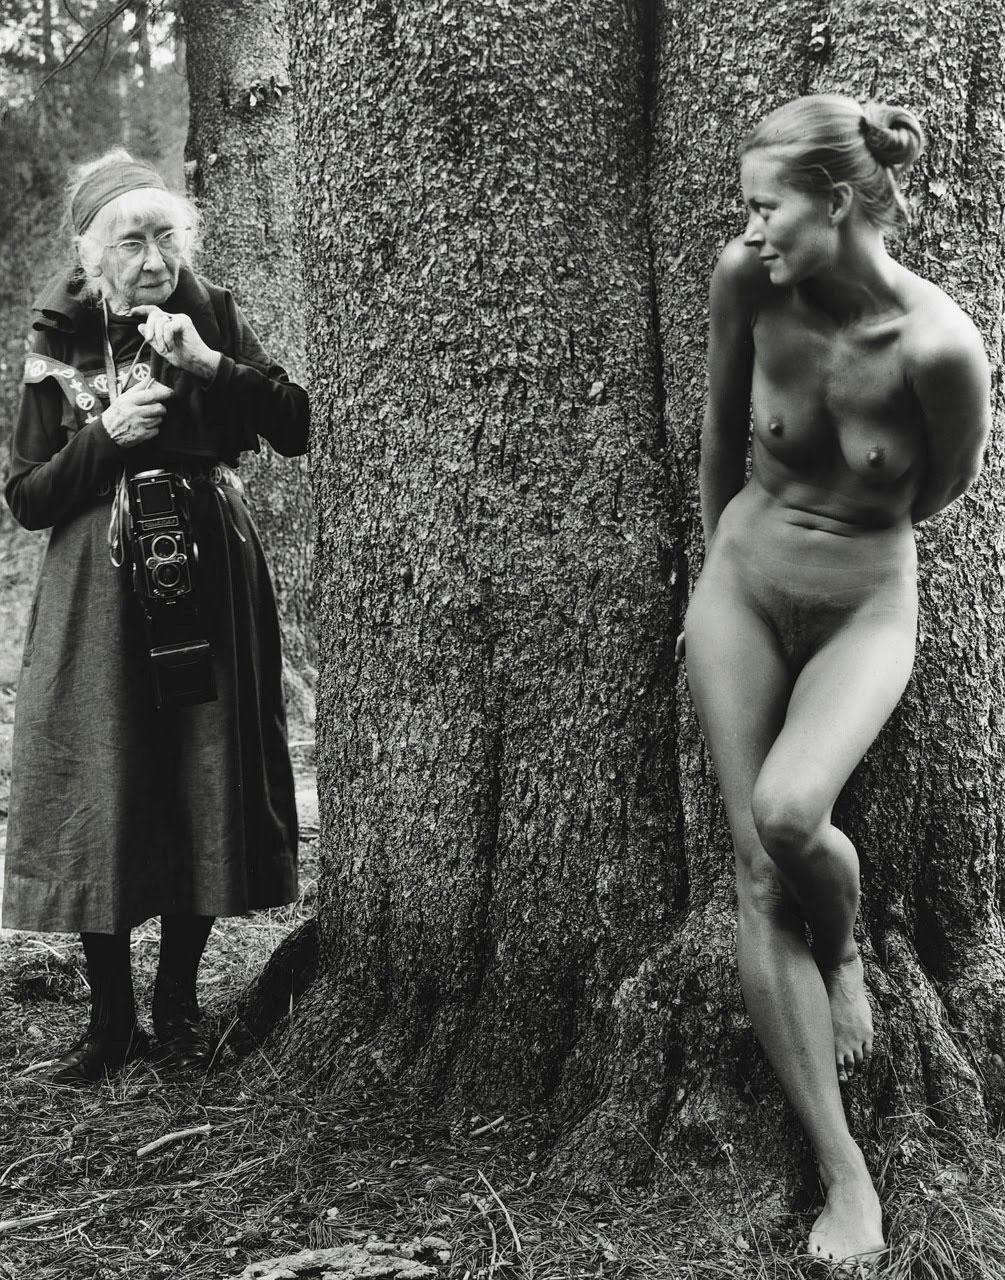 imogen-cunningham-and-twinka-thiebaud-by-judy-dater-1974-web.jpg